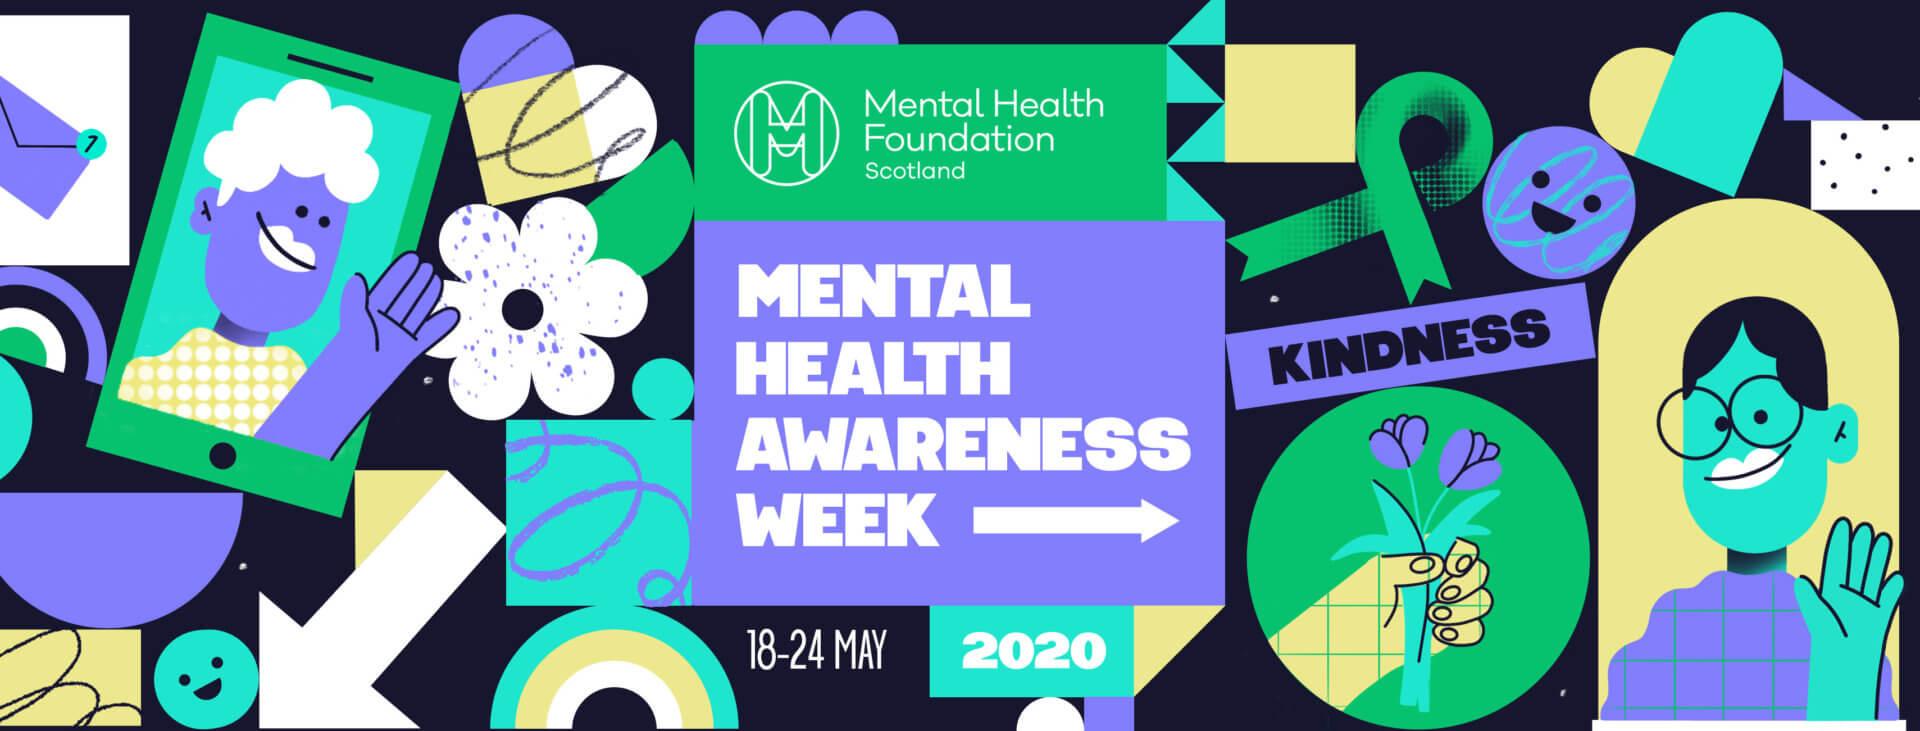 Mental Health Awareness Week: Spread a Little Kindness ...